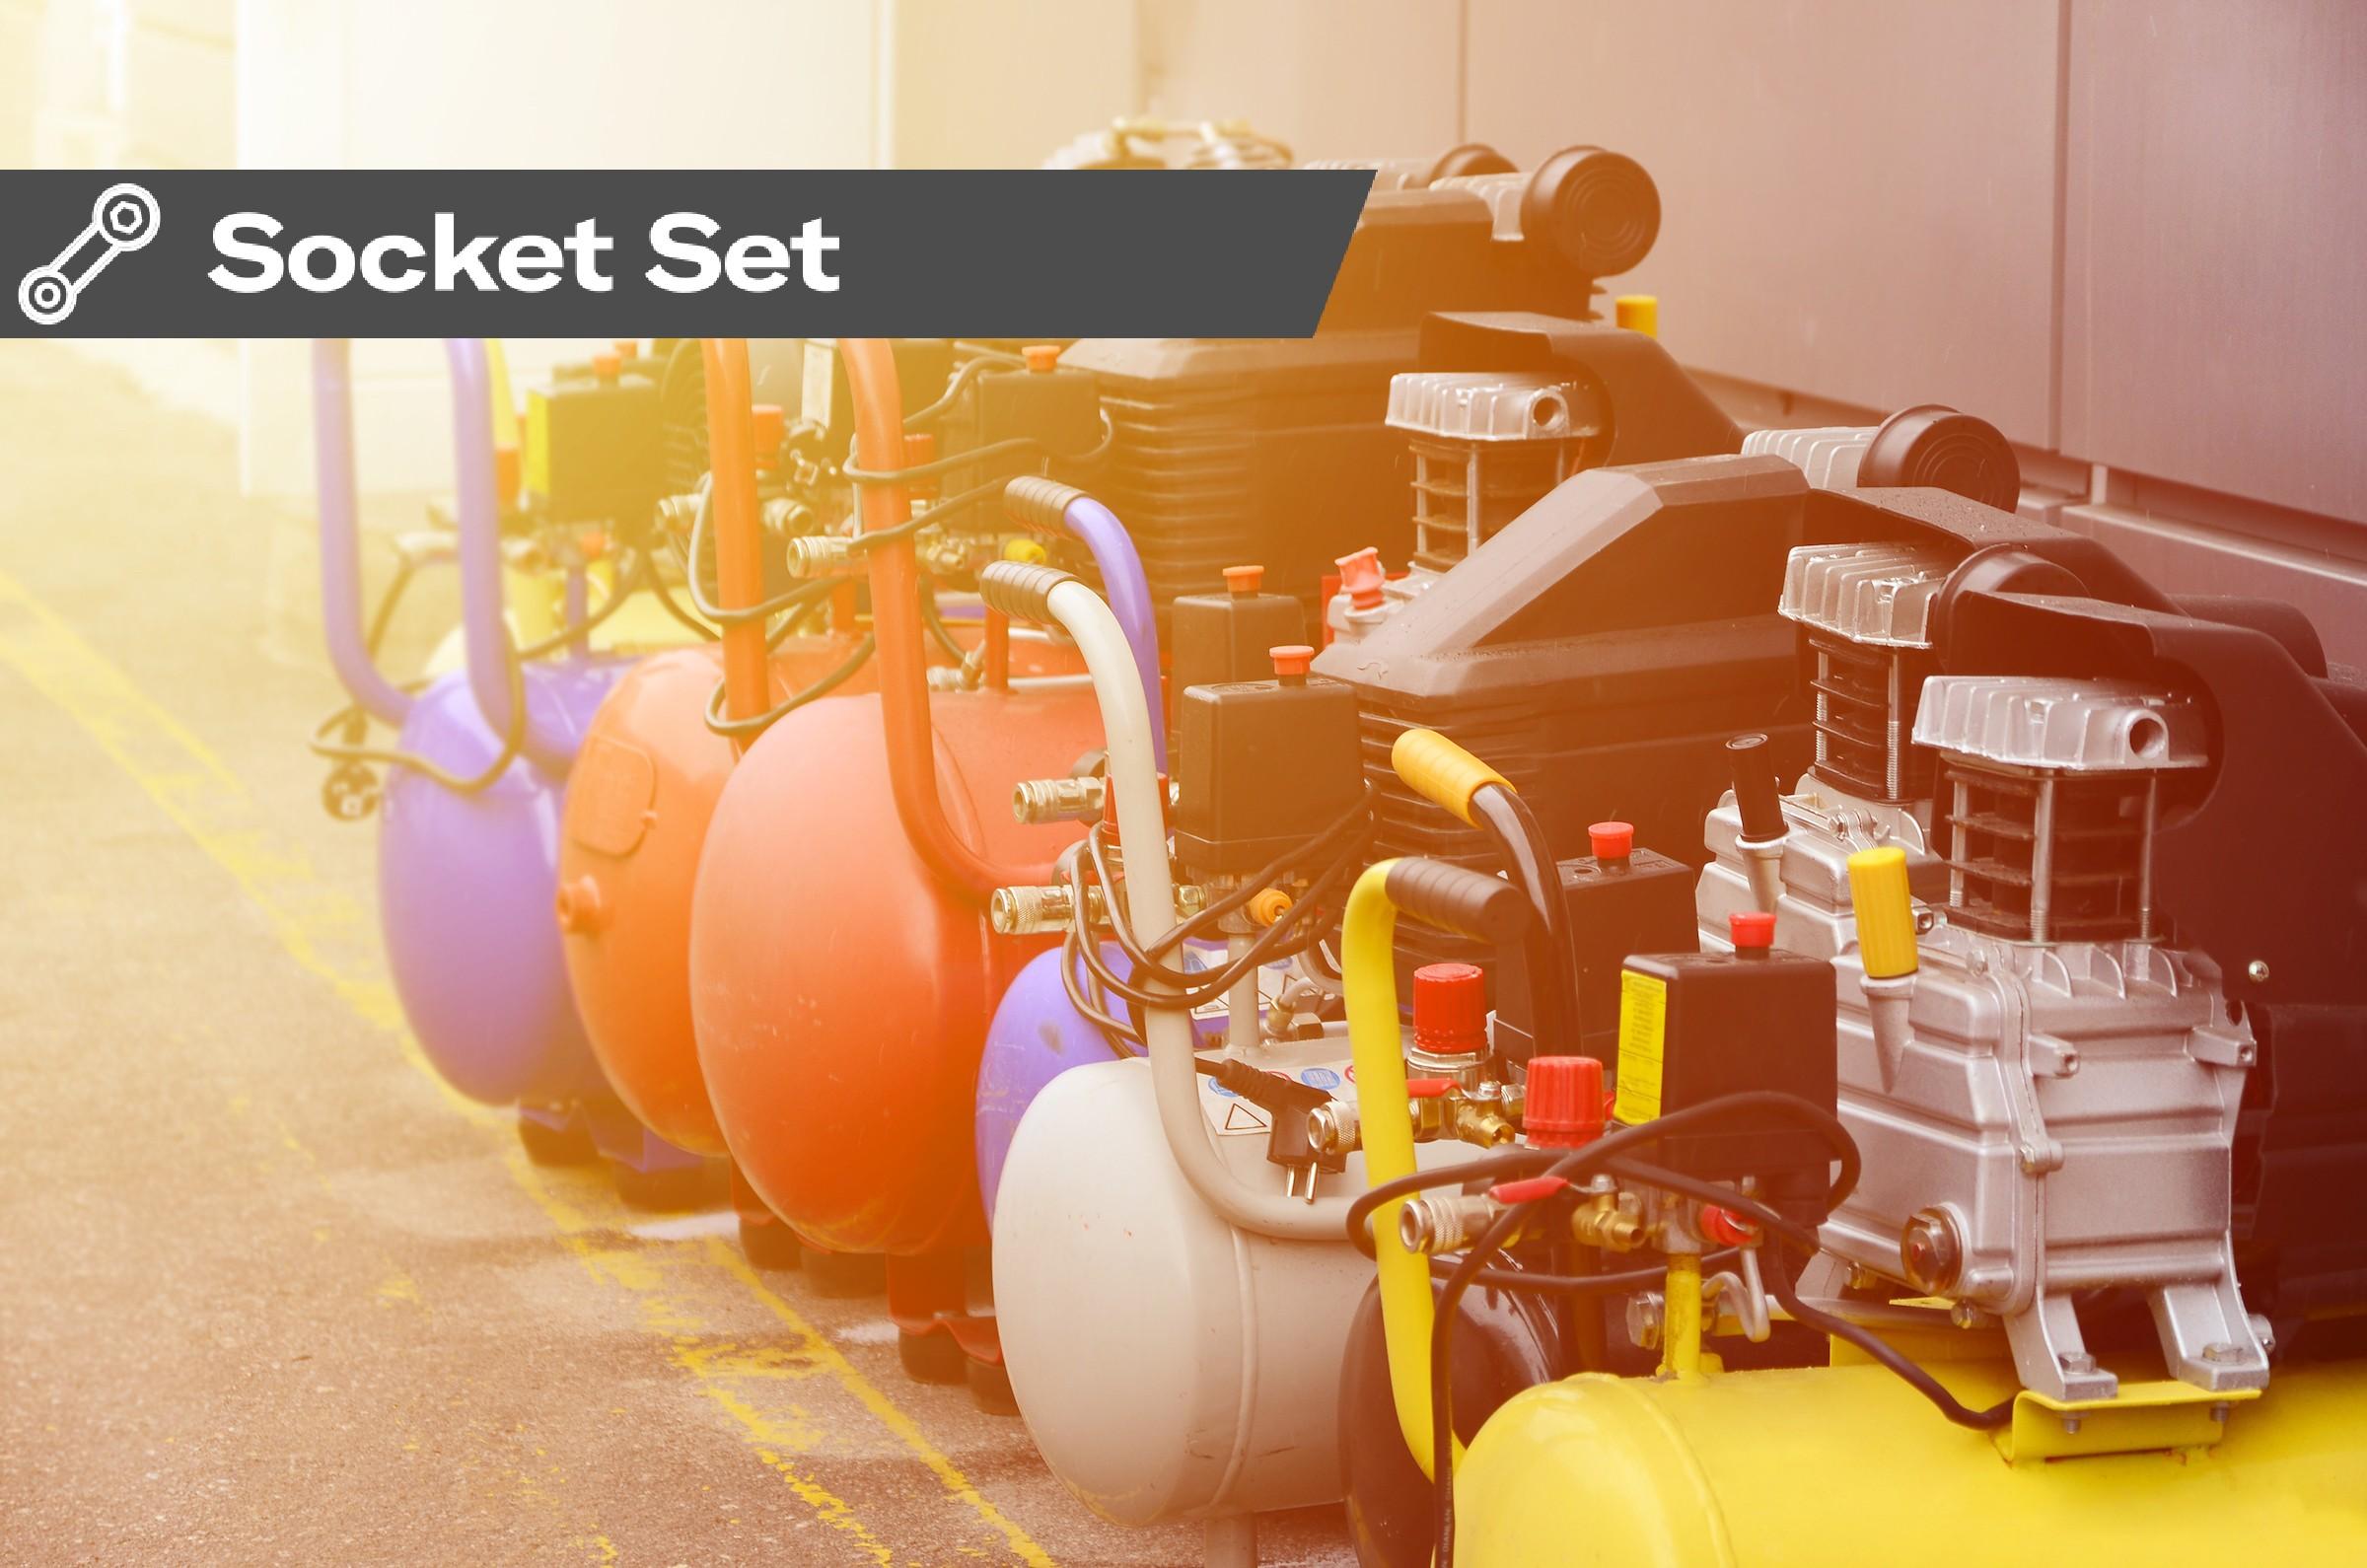 Socket Set: Compressors, your best friend in the workshop?